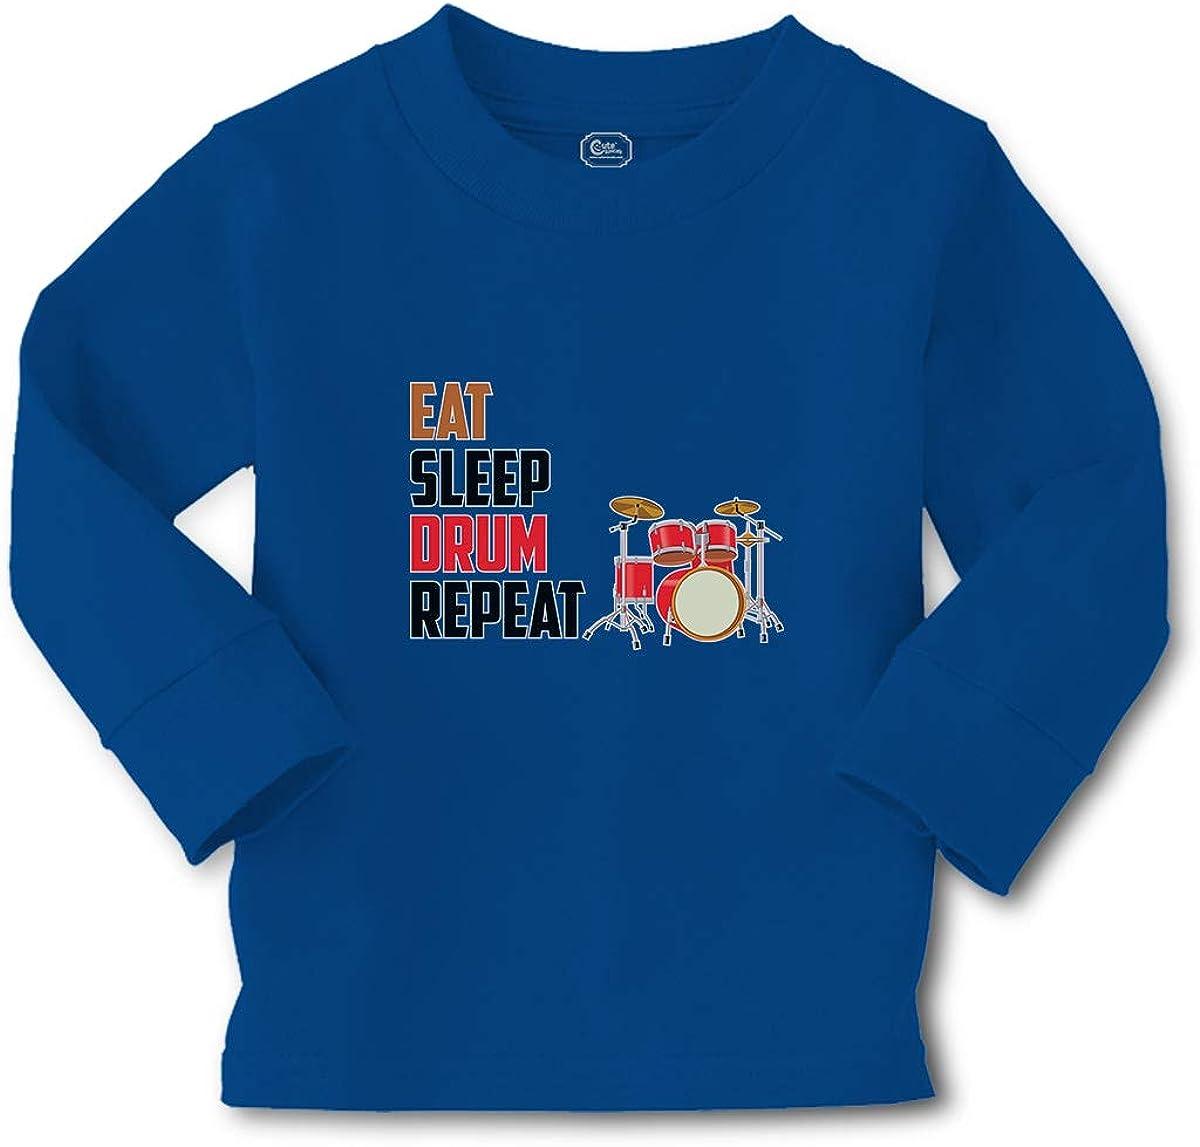 Cute Rascals Kids Long Sleeve T Shirt Eat Sleep Drum Repeat Musical Cotton Boy & Girl Clothes